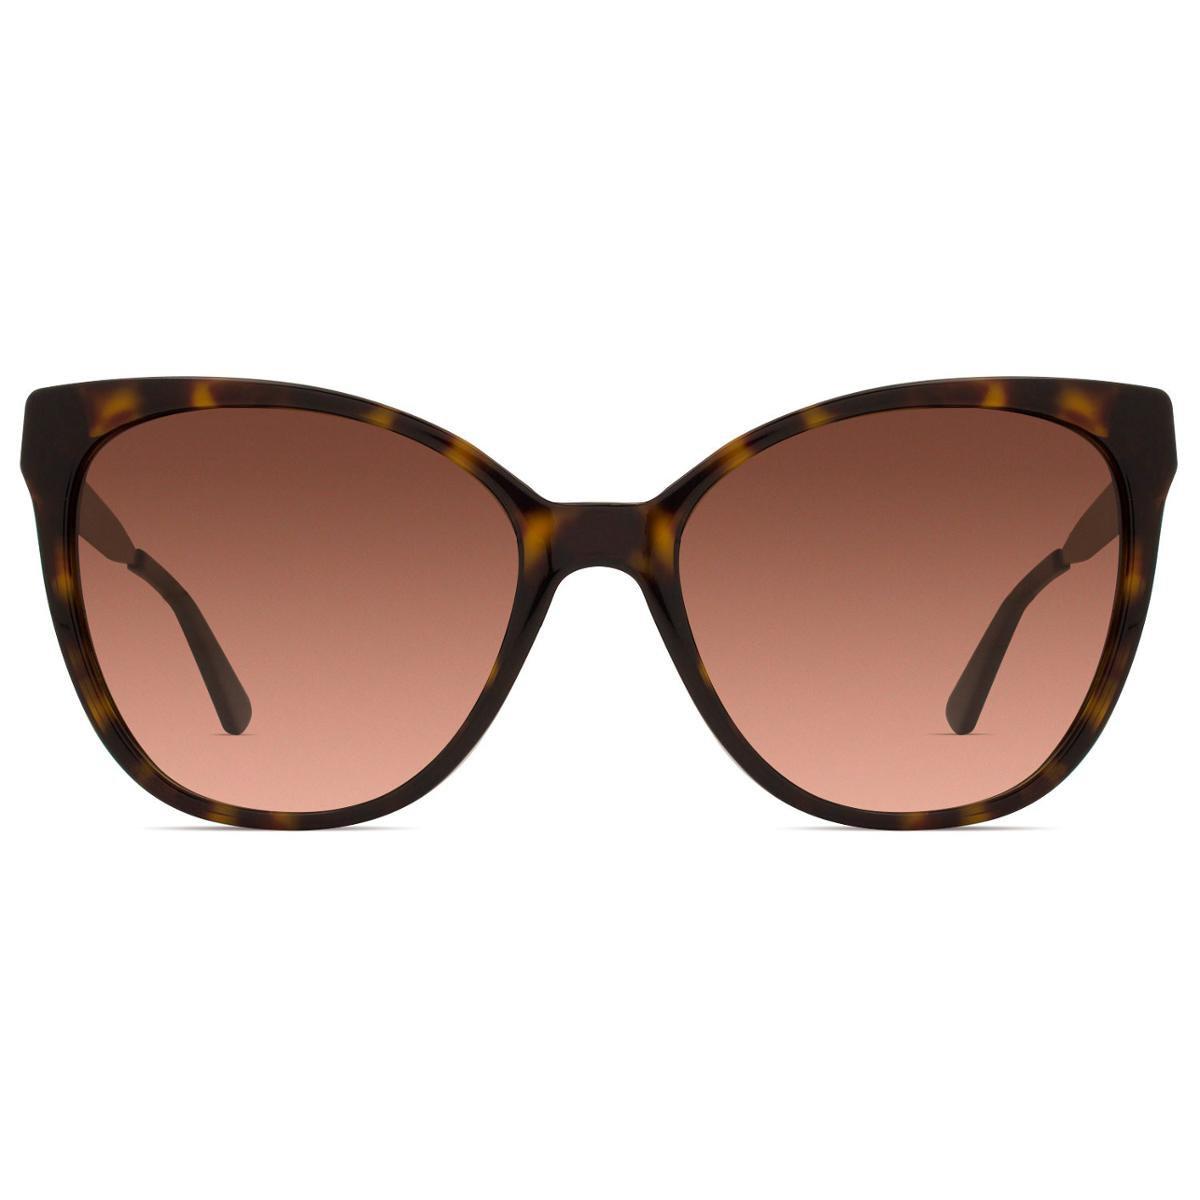 cd8c2c1bb Óculos de Sol Michael Kors Napa MK Feminino - Marrom - Compre Agora    Zattini